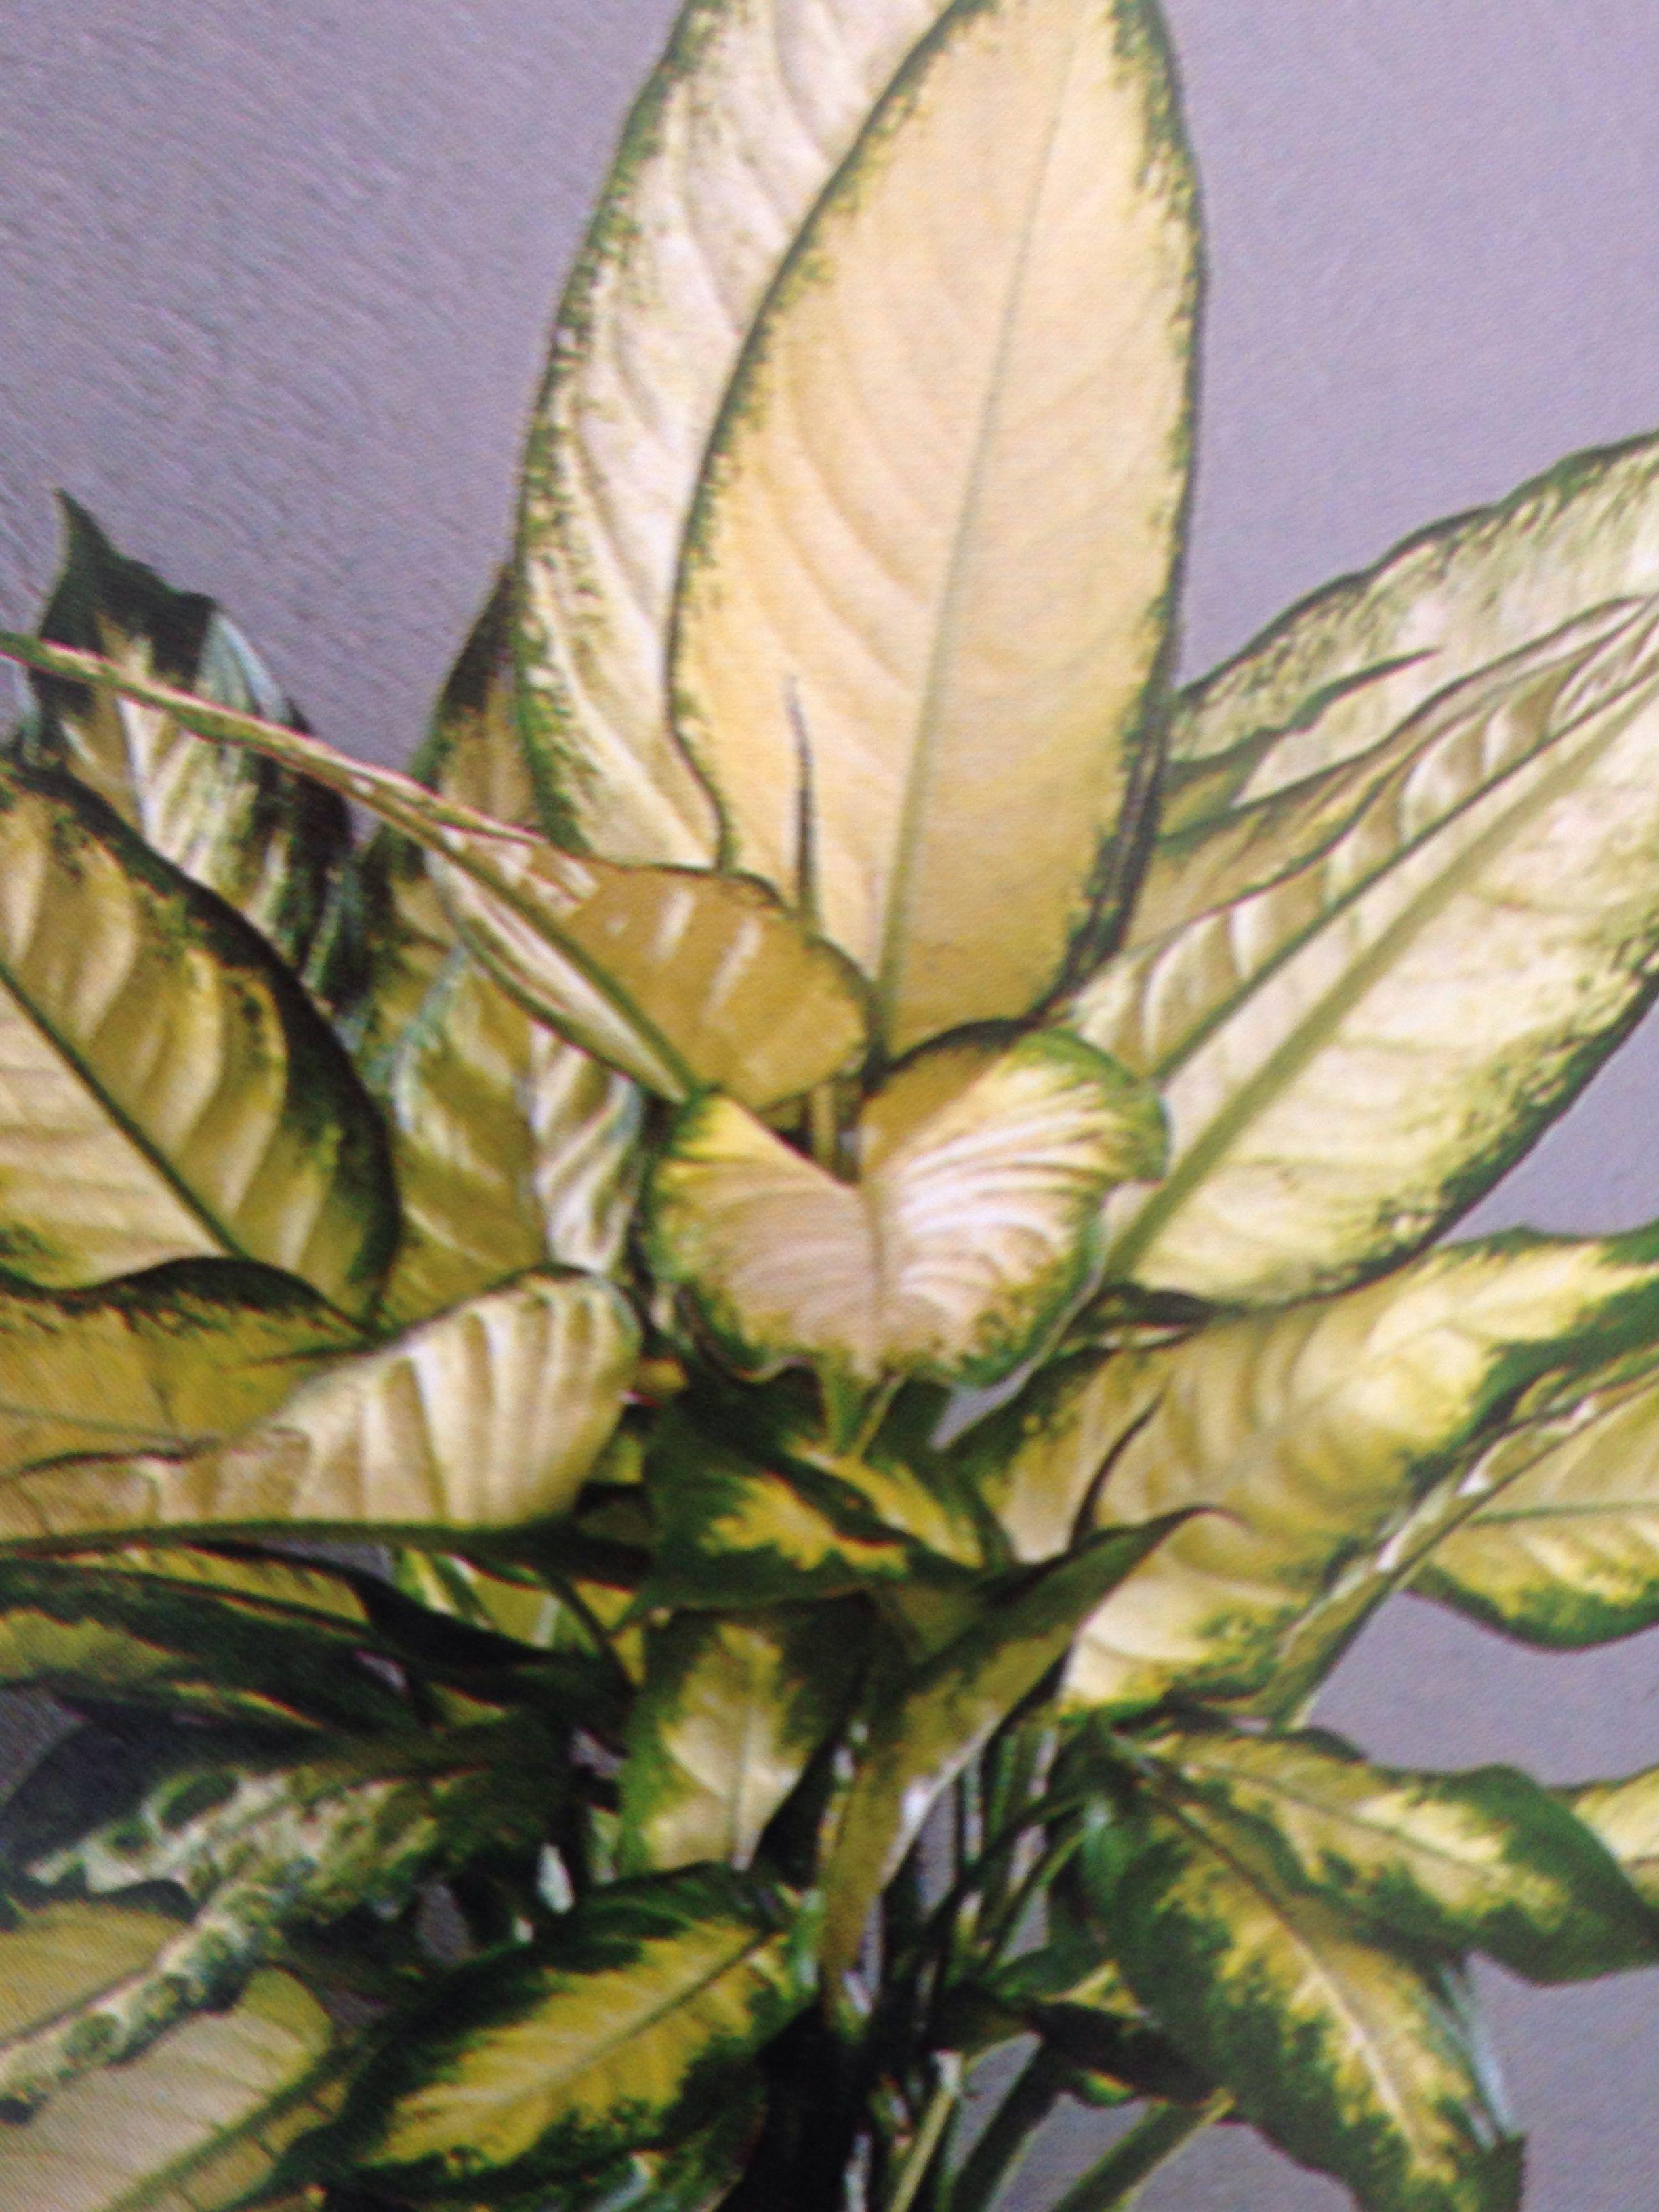 Diffenbacchia maculata cuidado es una planta peligrosa for Planta ornamental venenosa dieffenbachia